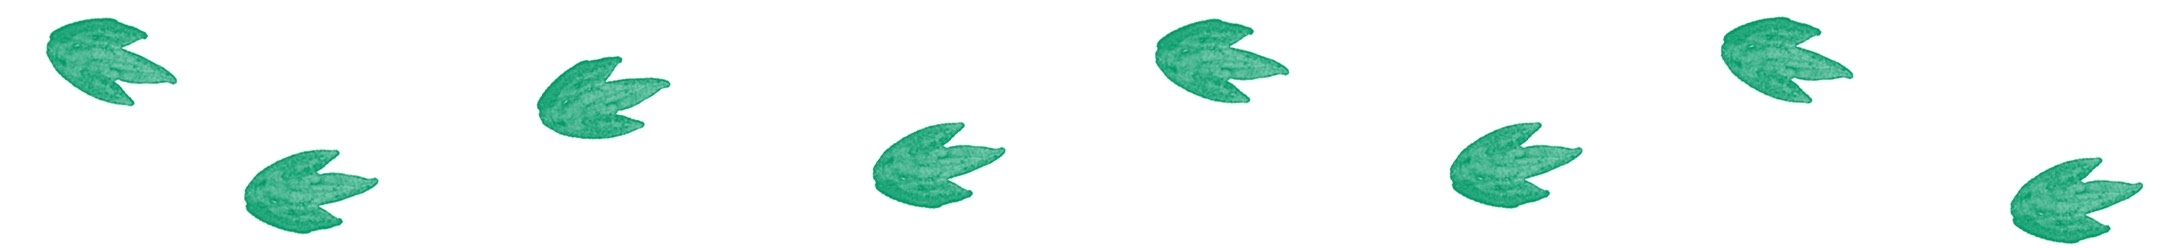 footprints_linebreakArtboard-2.png.jpeg